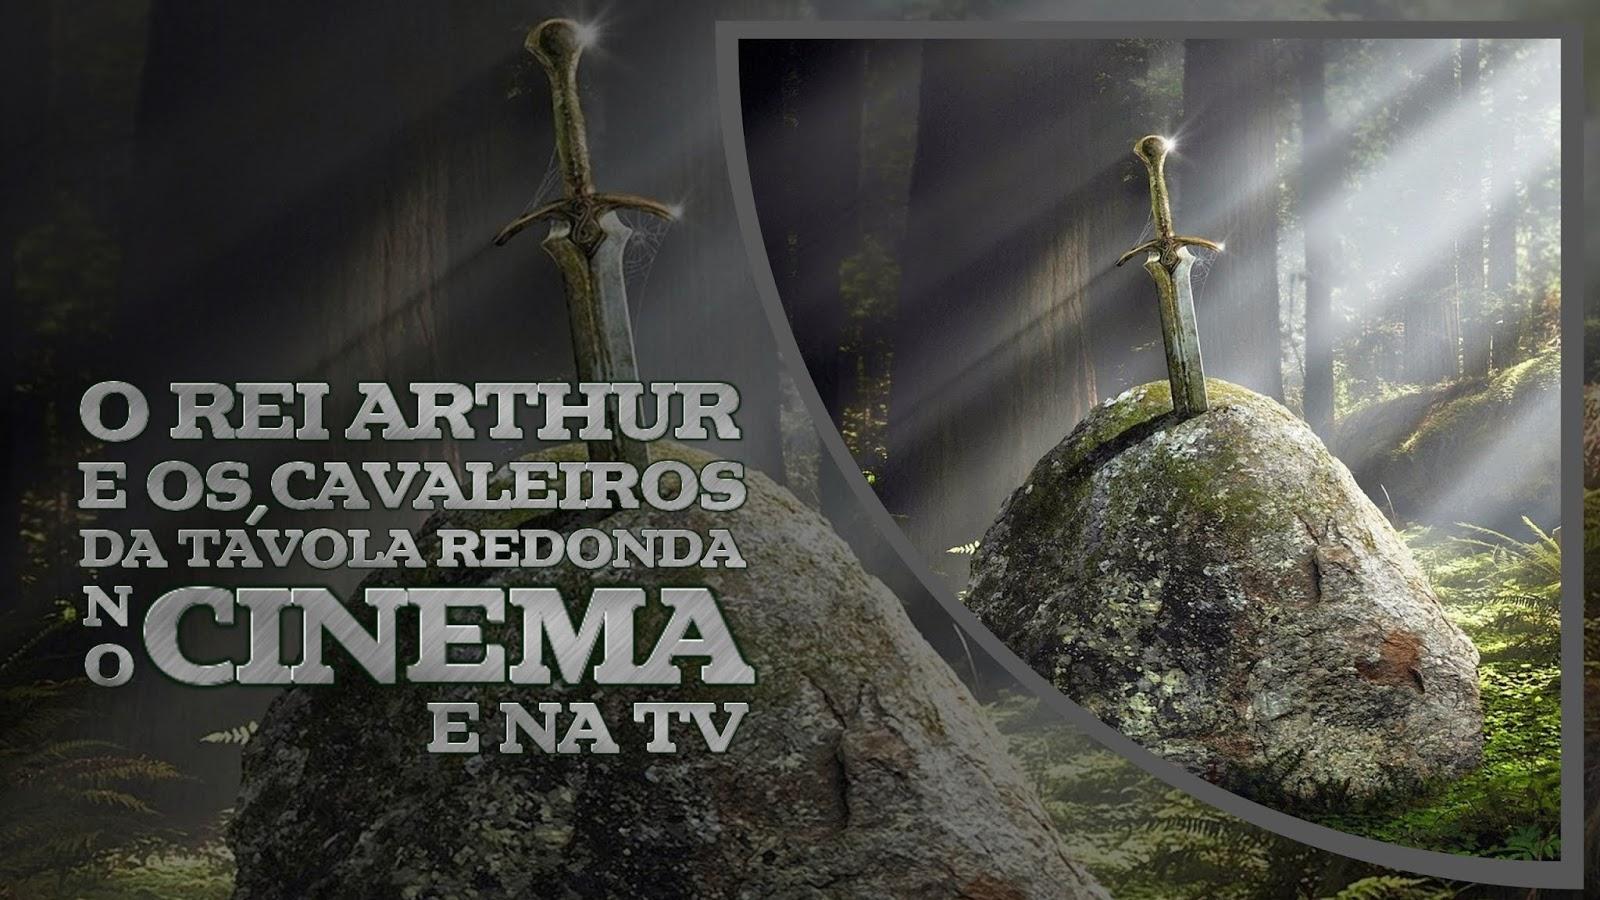 o-rei-arthur-no-cinema-e-tv